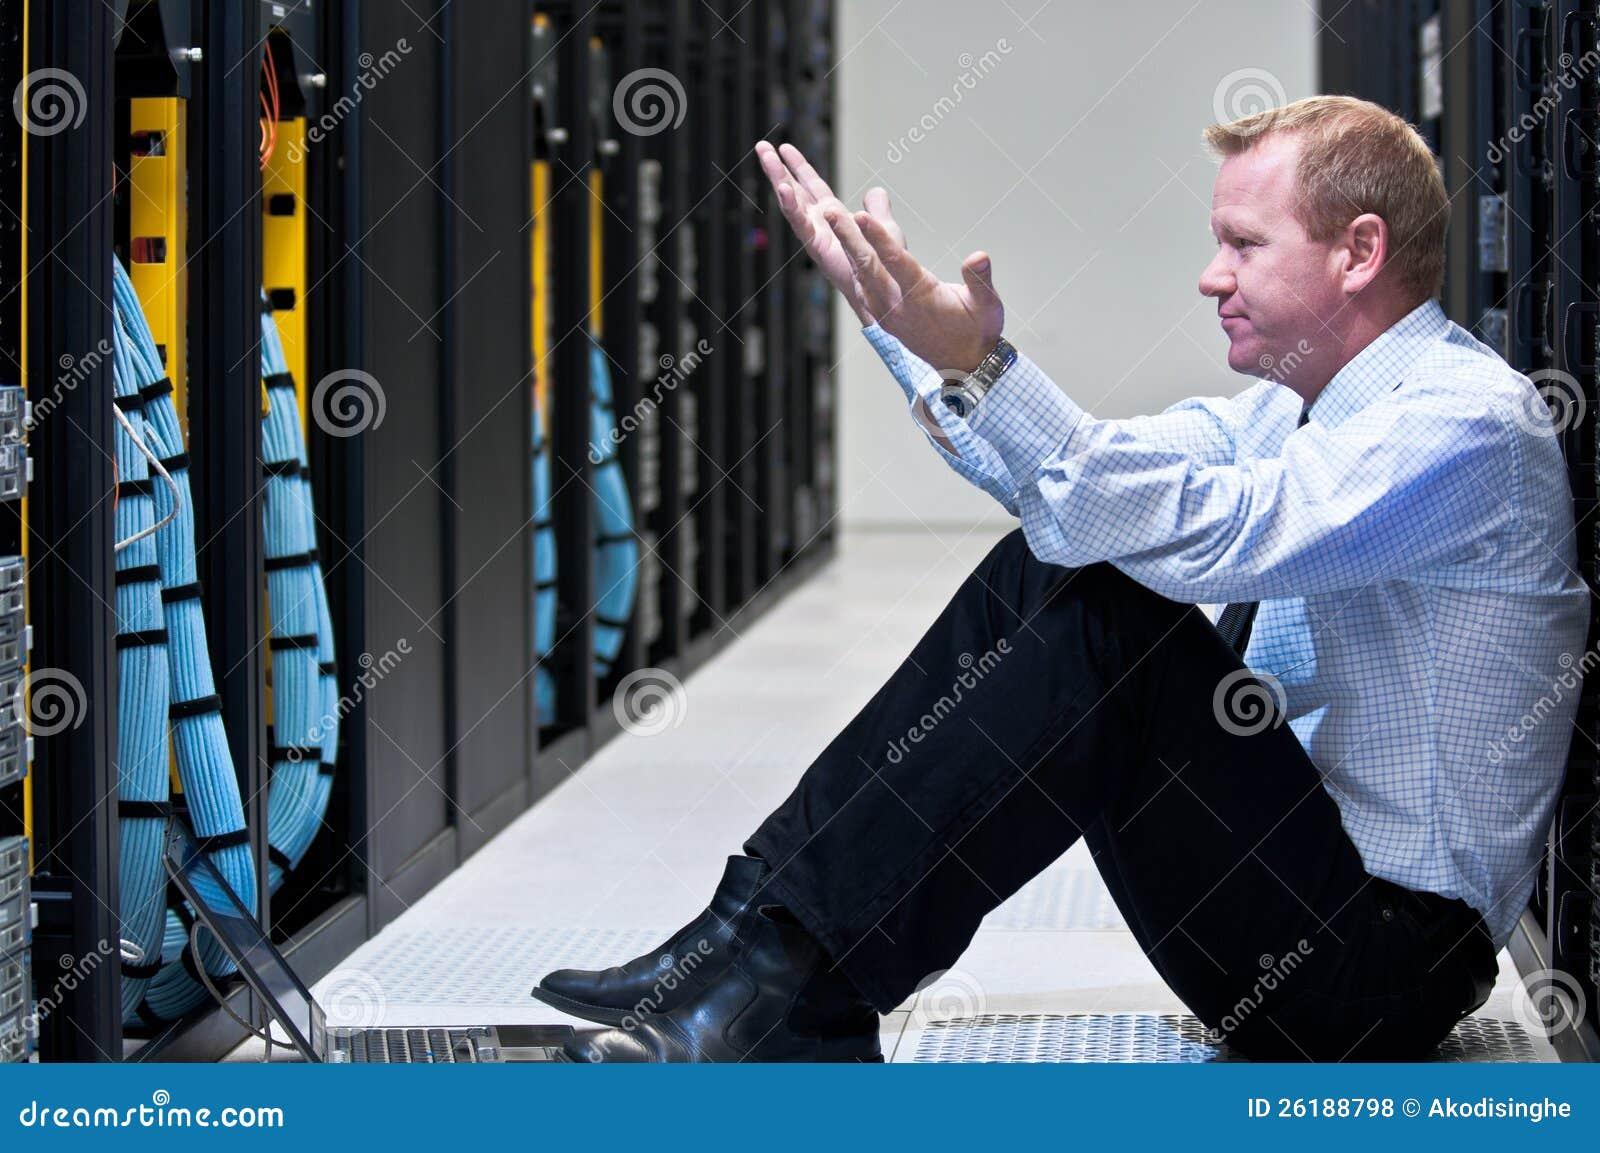 Server Failure Royalty Free Stock Photos Image 26188798